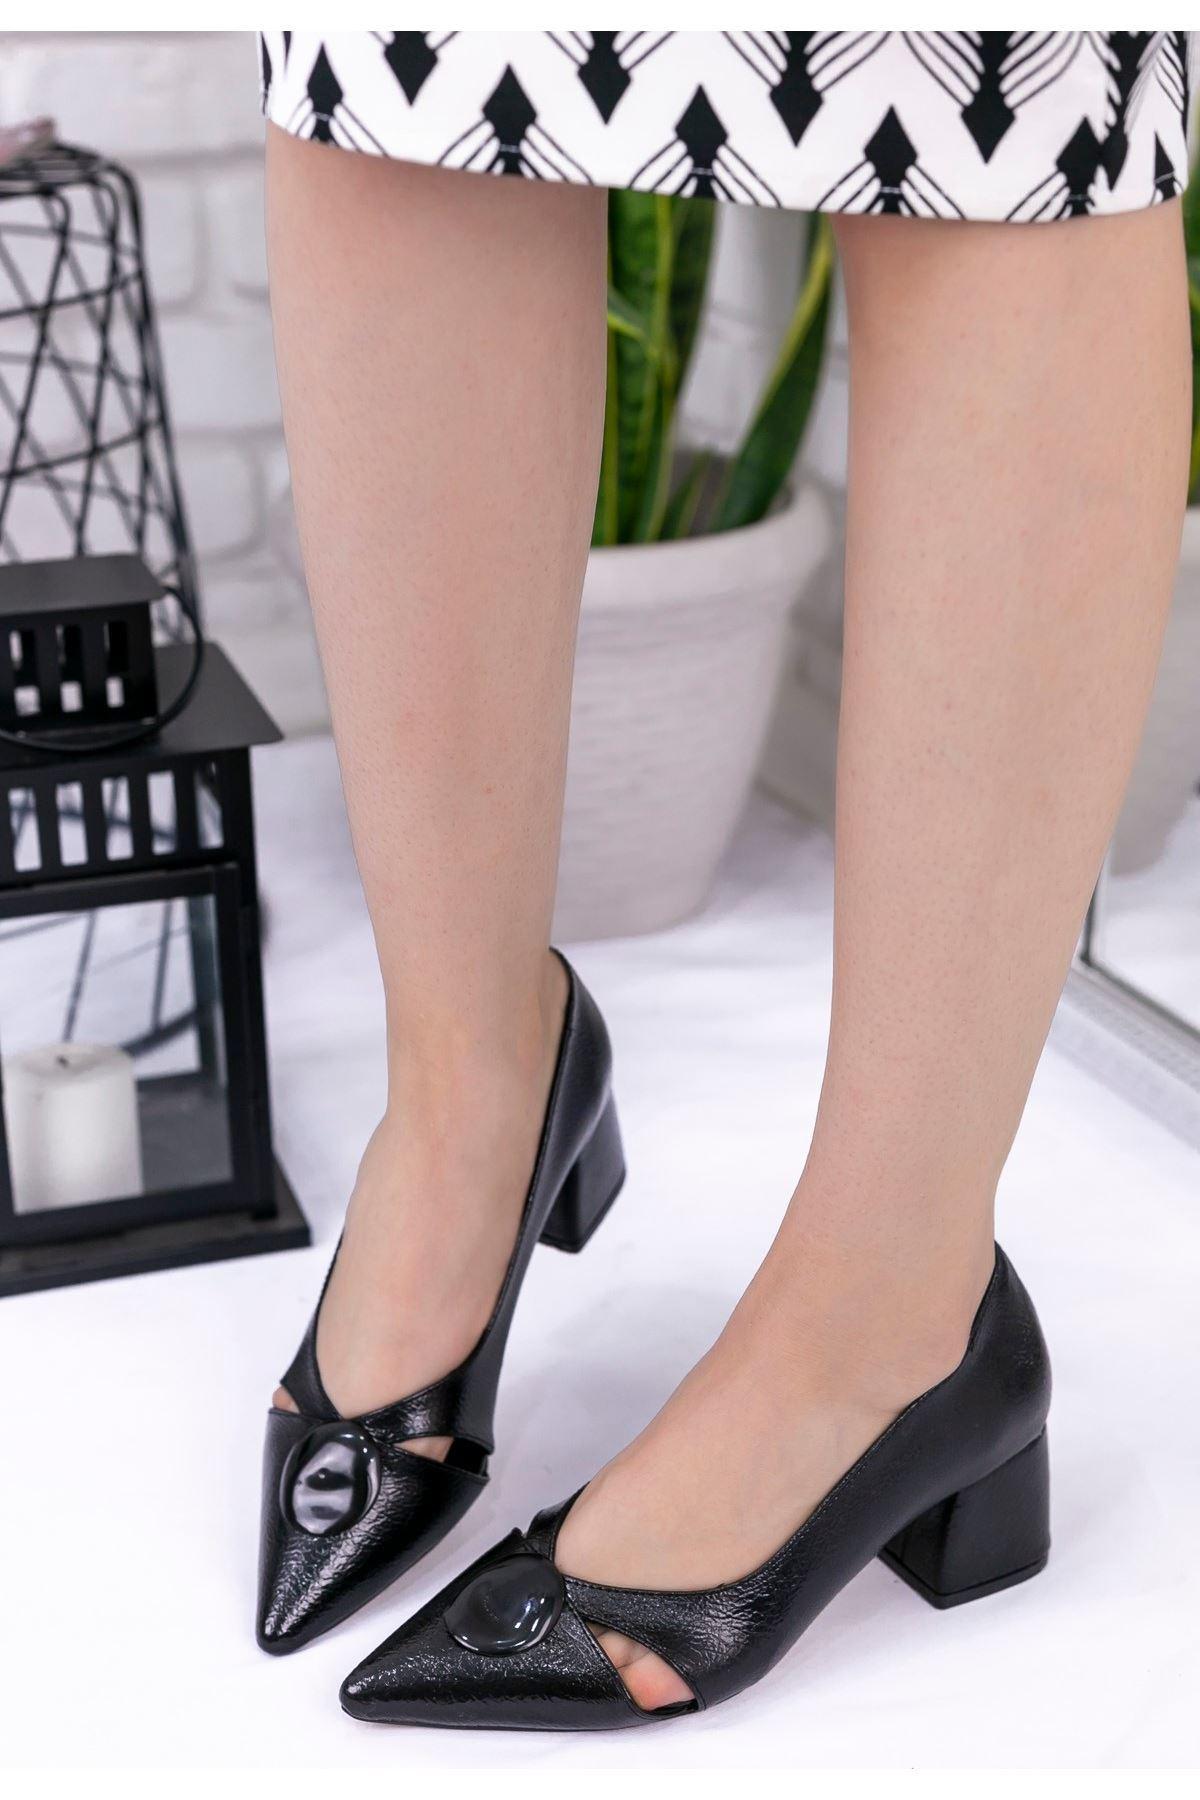 Melvi Siyah Rugan Desenli Topuklu Ayakkabı